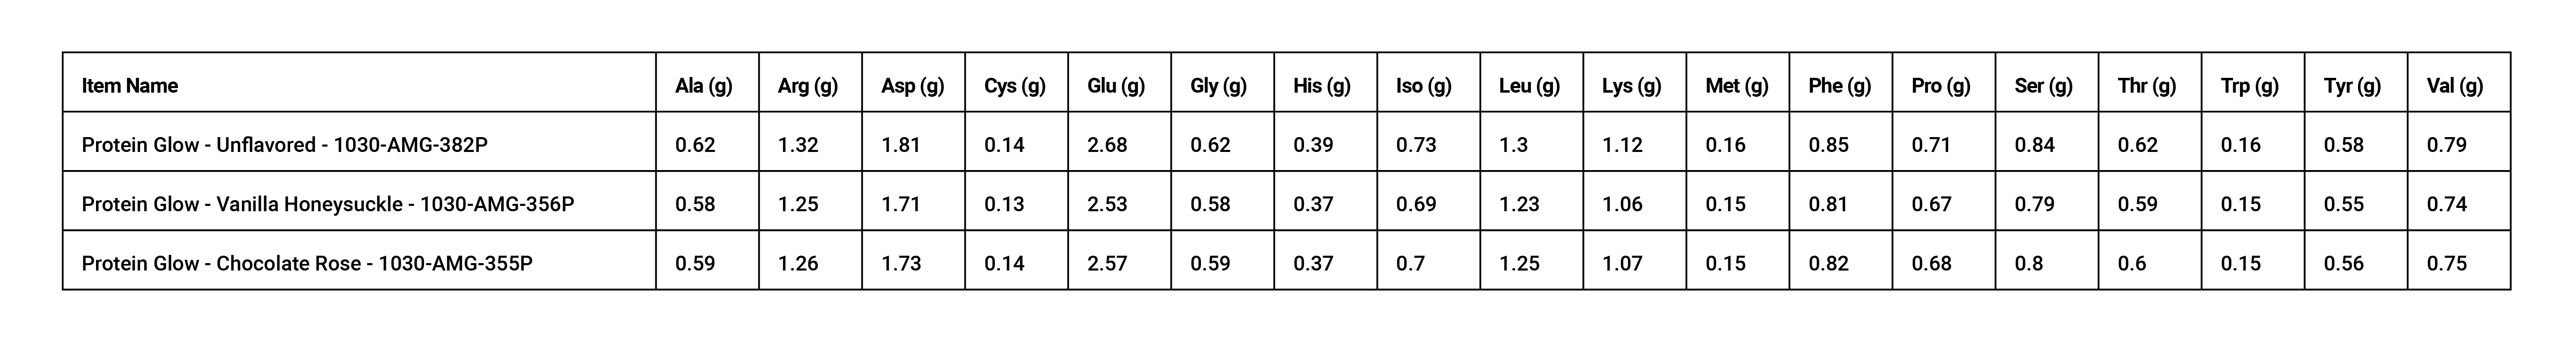 Glow AminoAcids